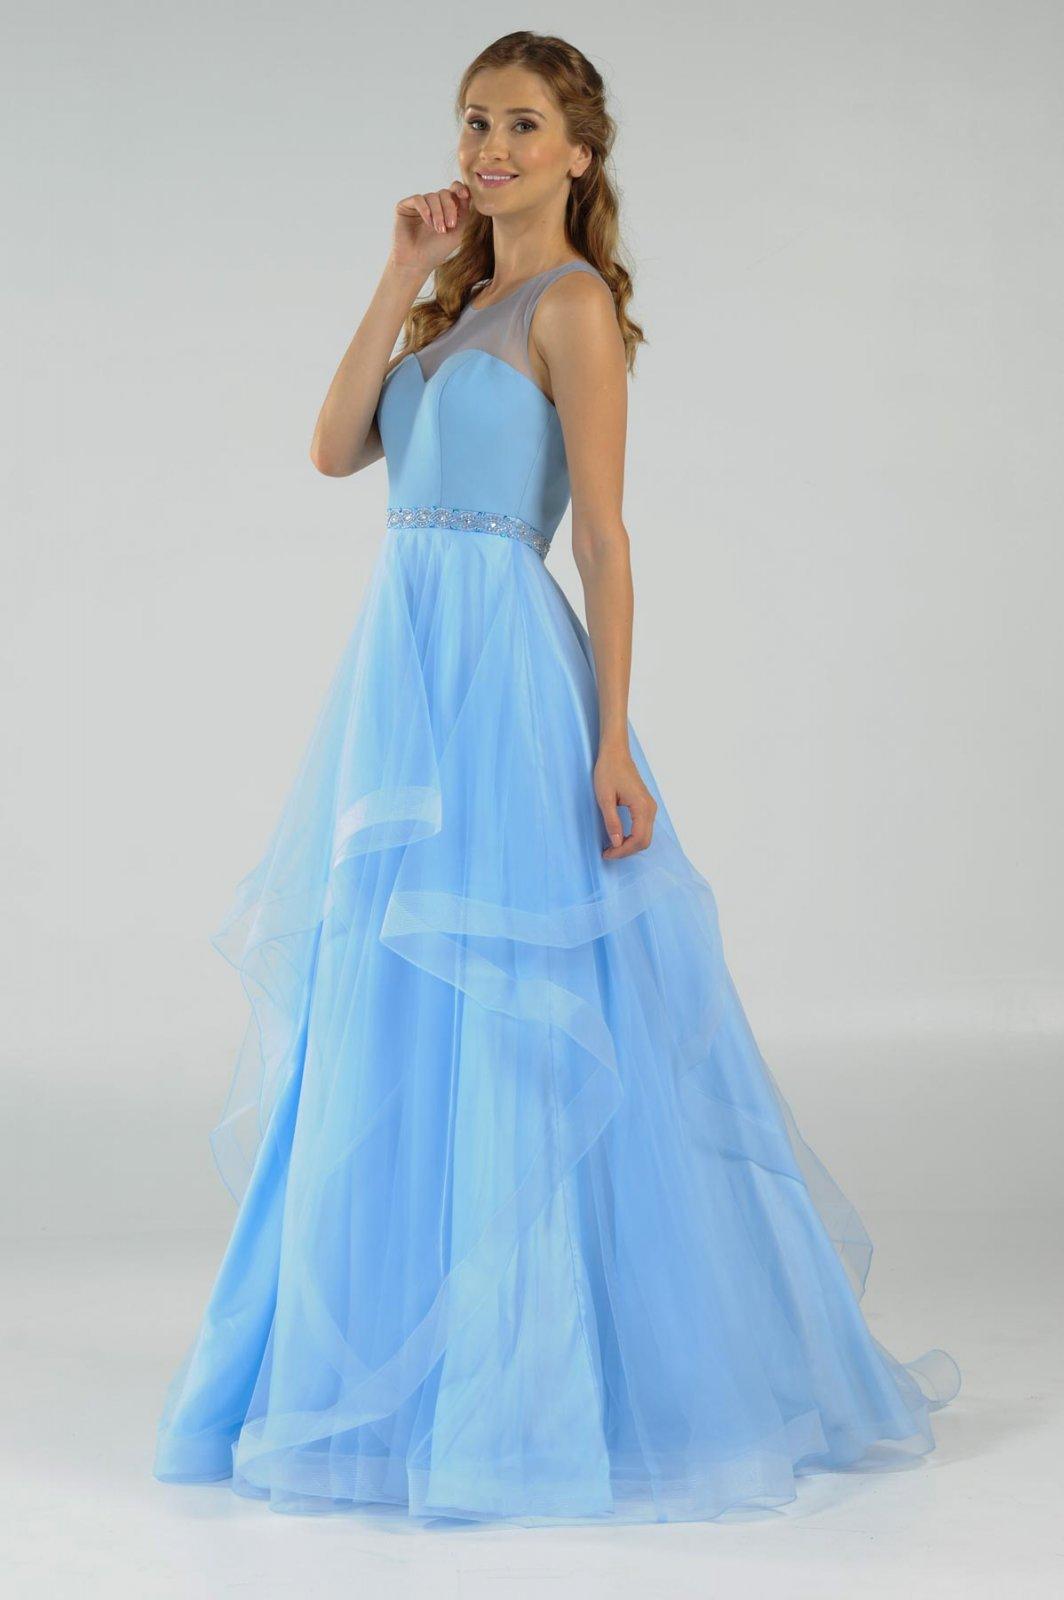 f5f61f27026 Ice Blue Organza Long Prom Dress With Illusion Neckline